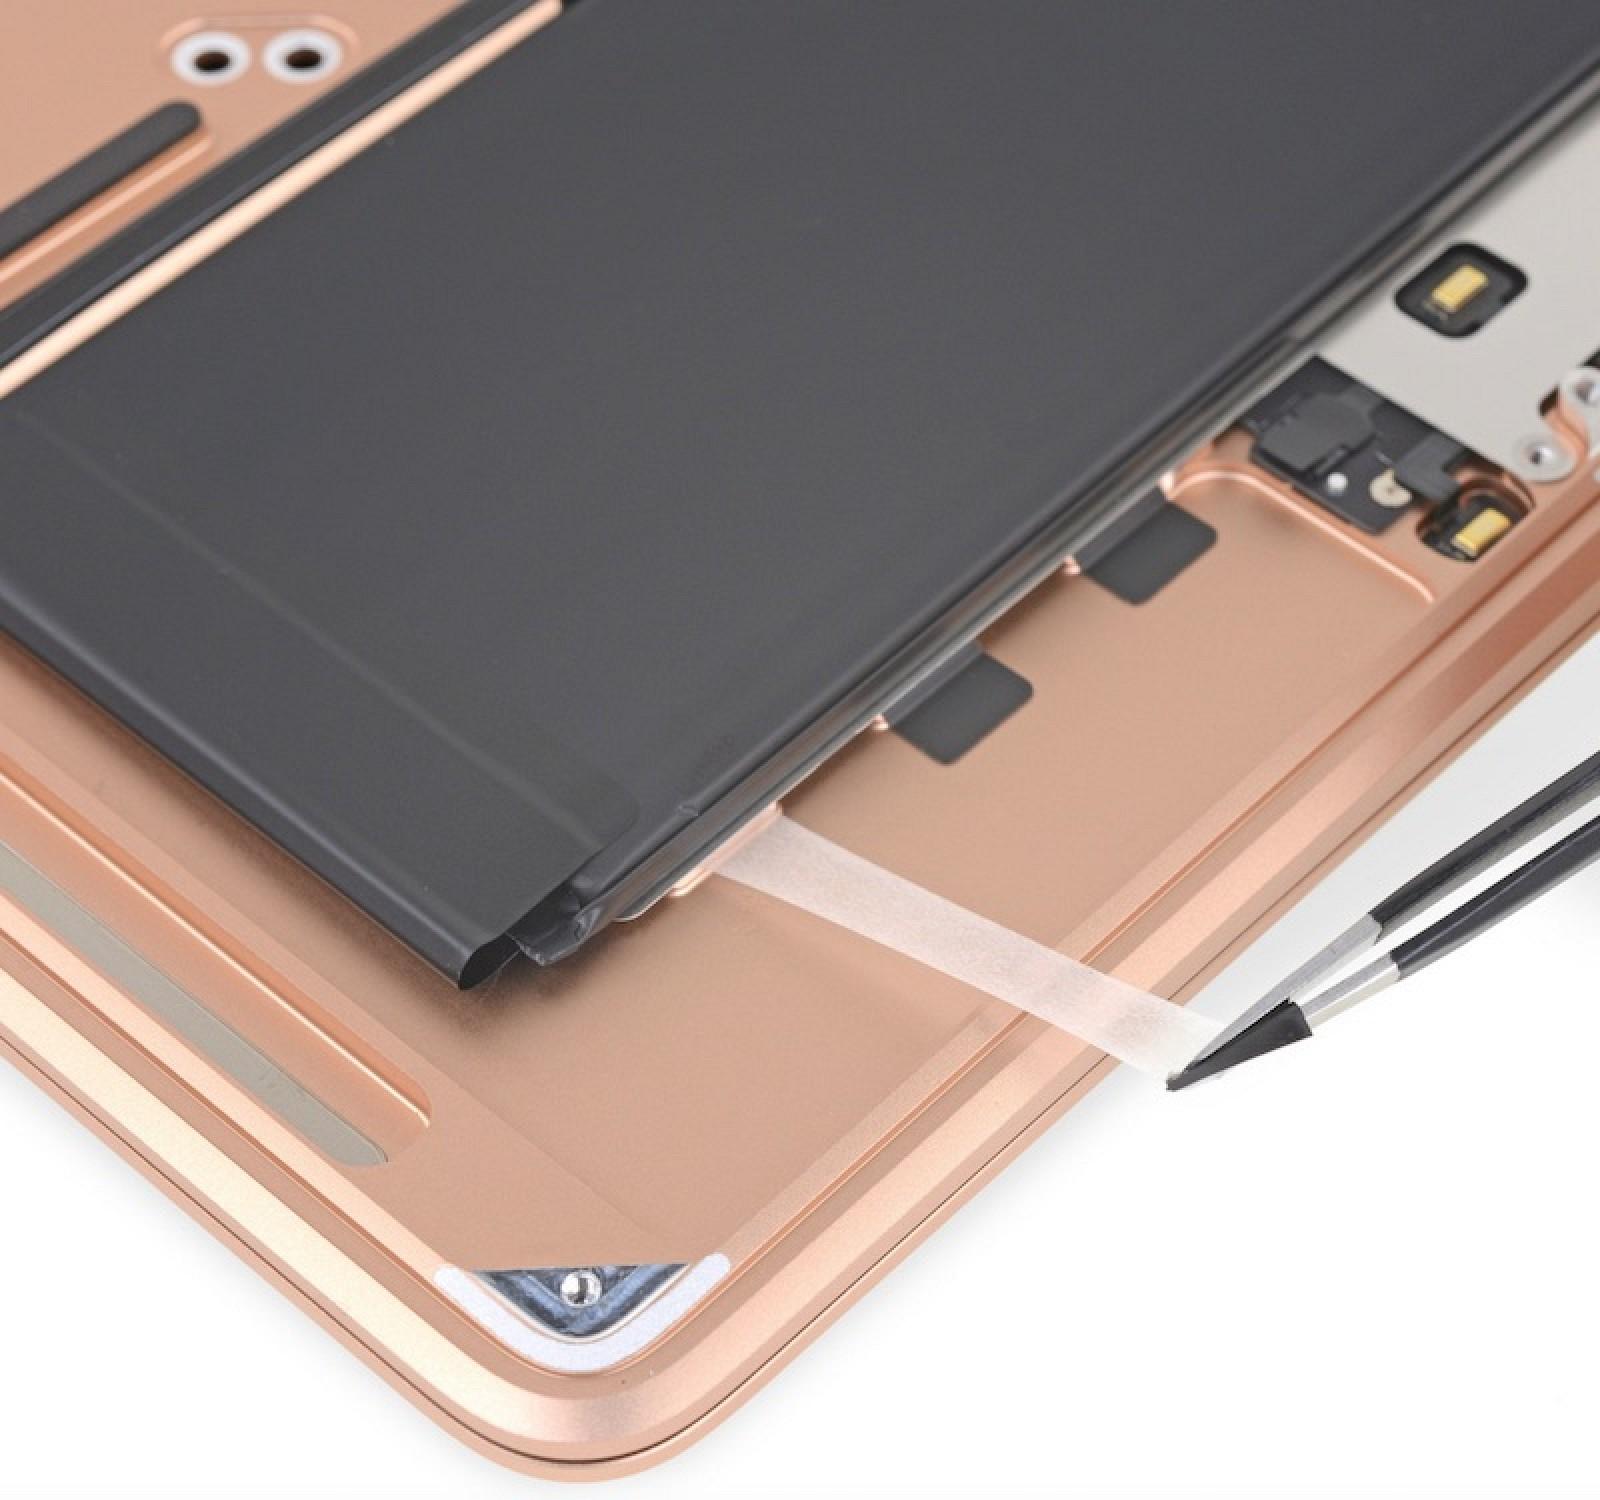 huge selection of 37151 ec902 2018 MacBook Air Teardown Confirms Improving Repairability With ...